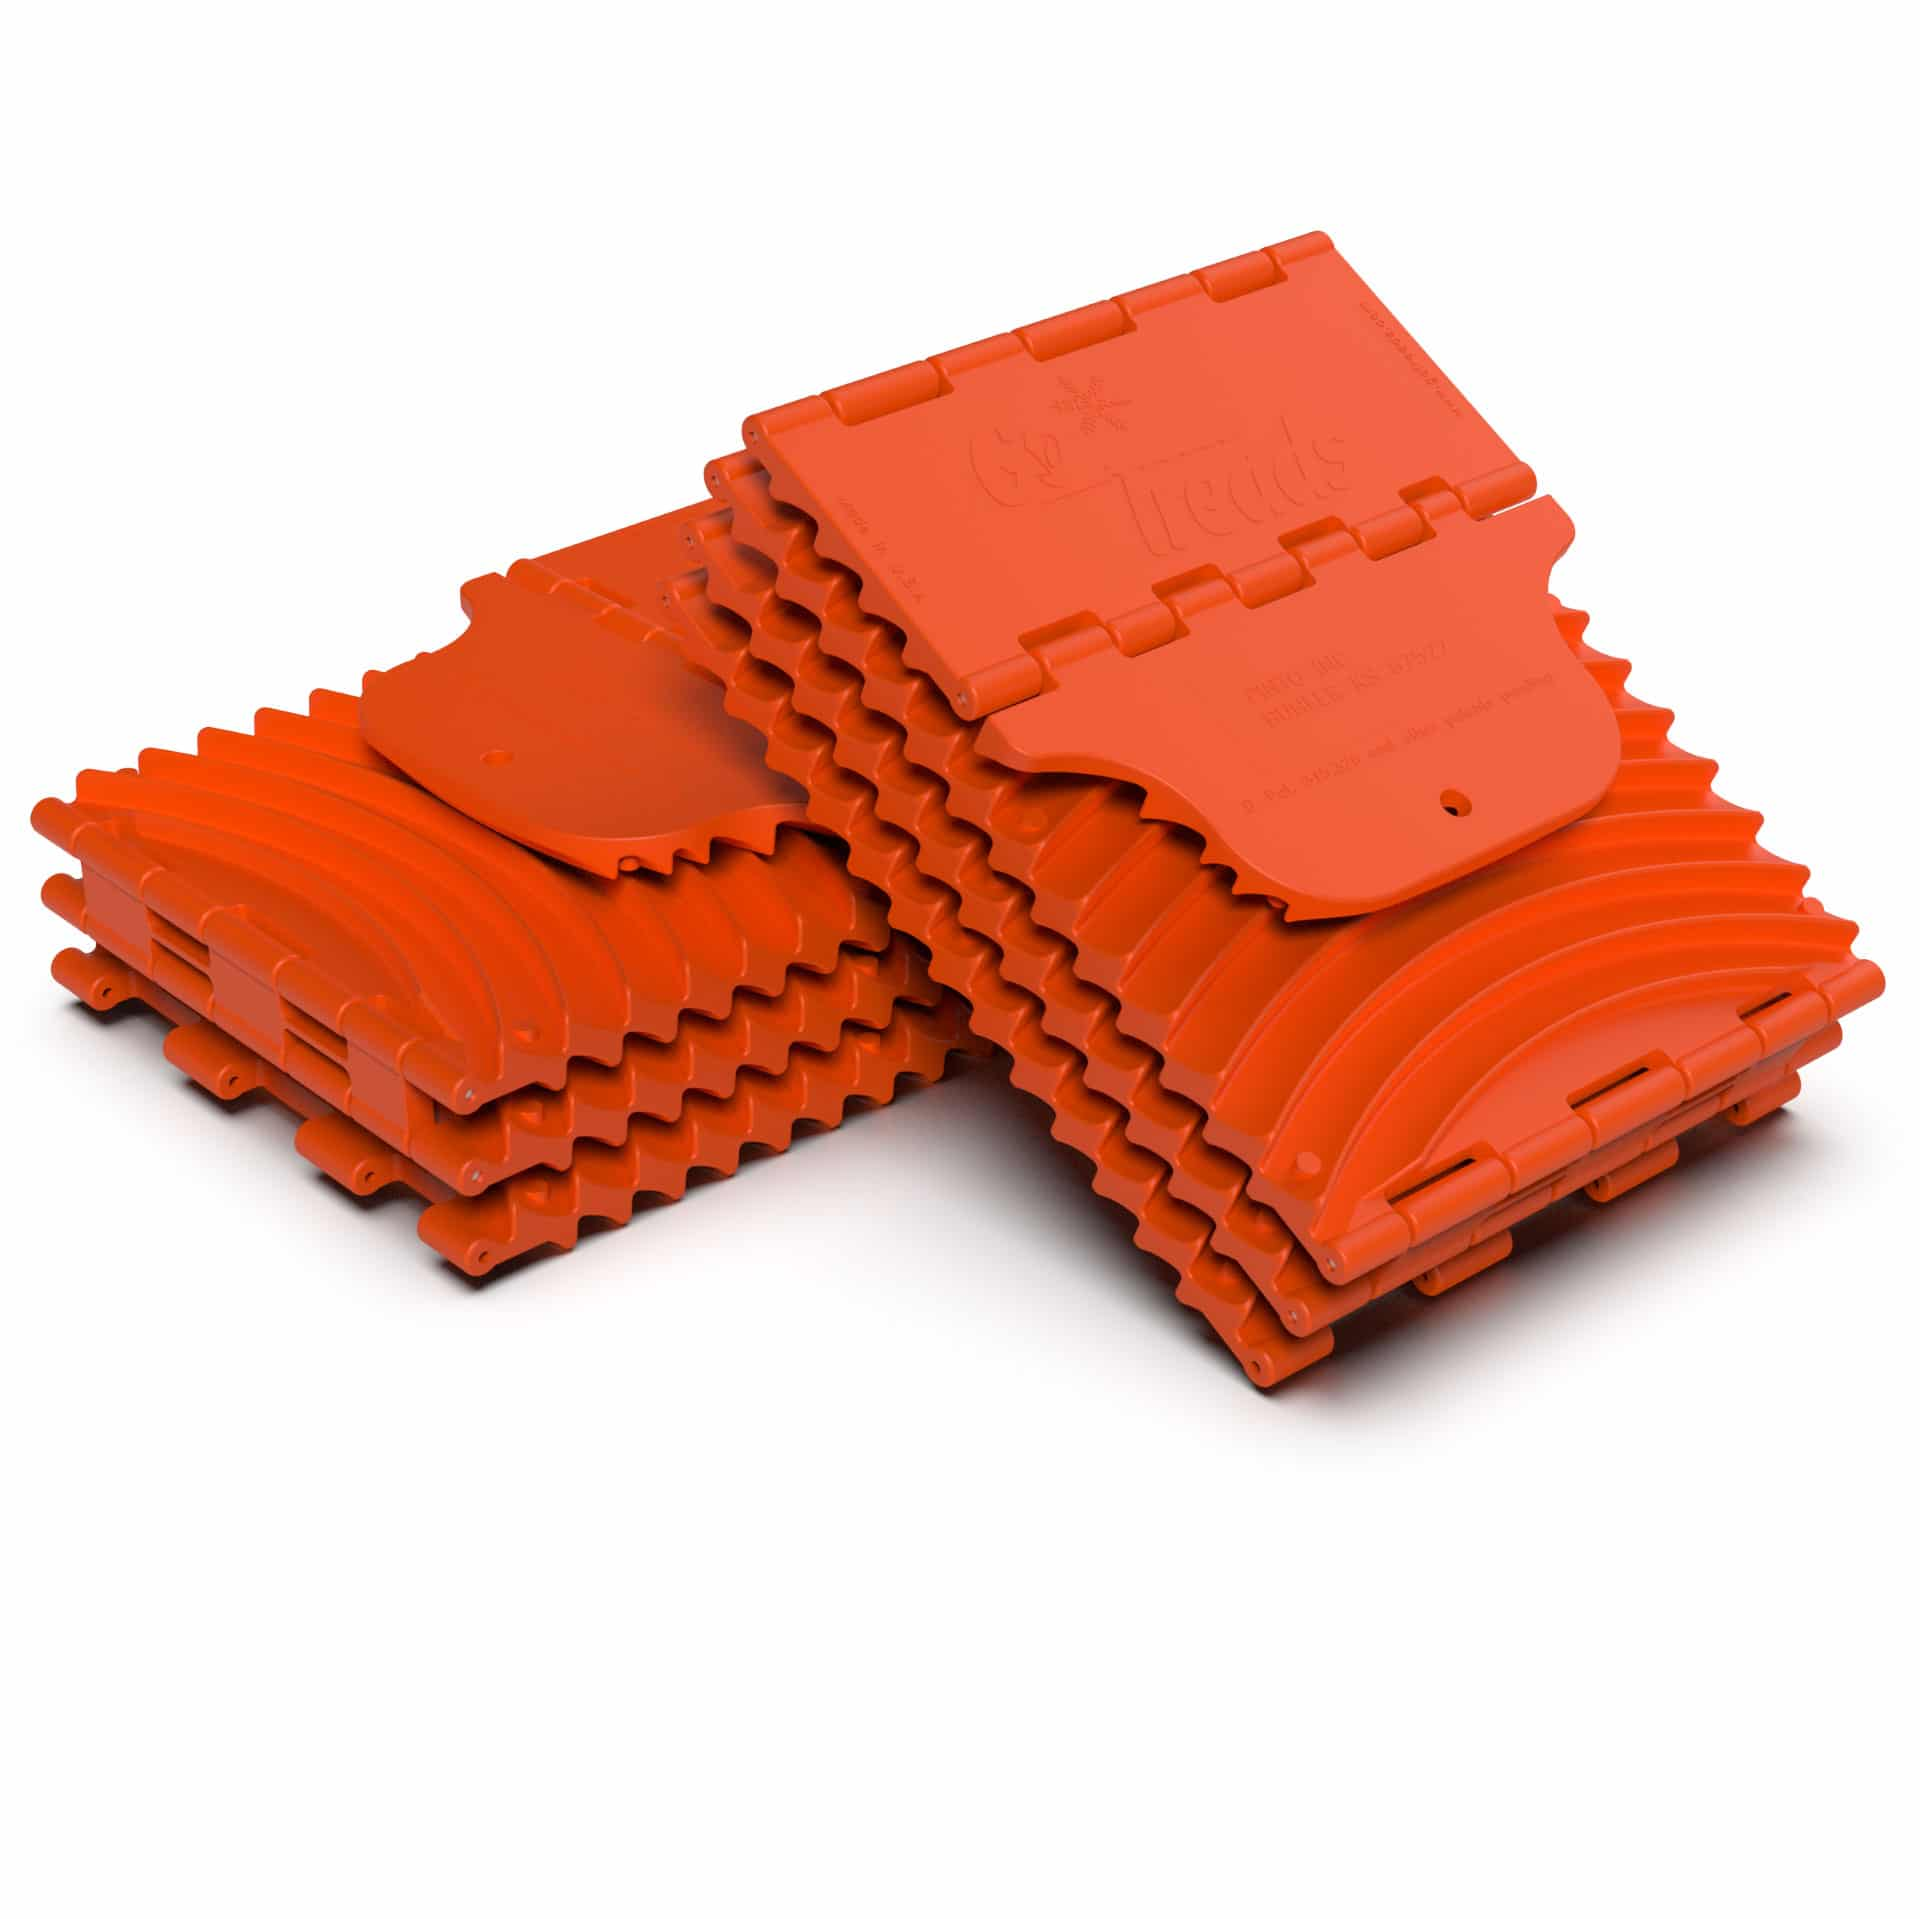 GoTreads Standard - Orange